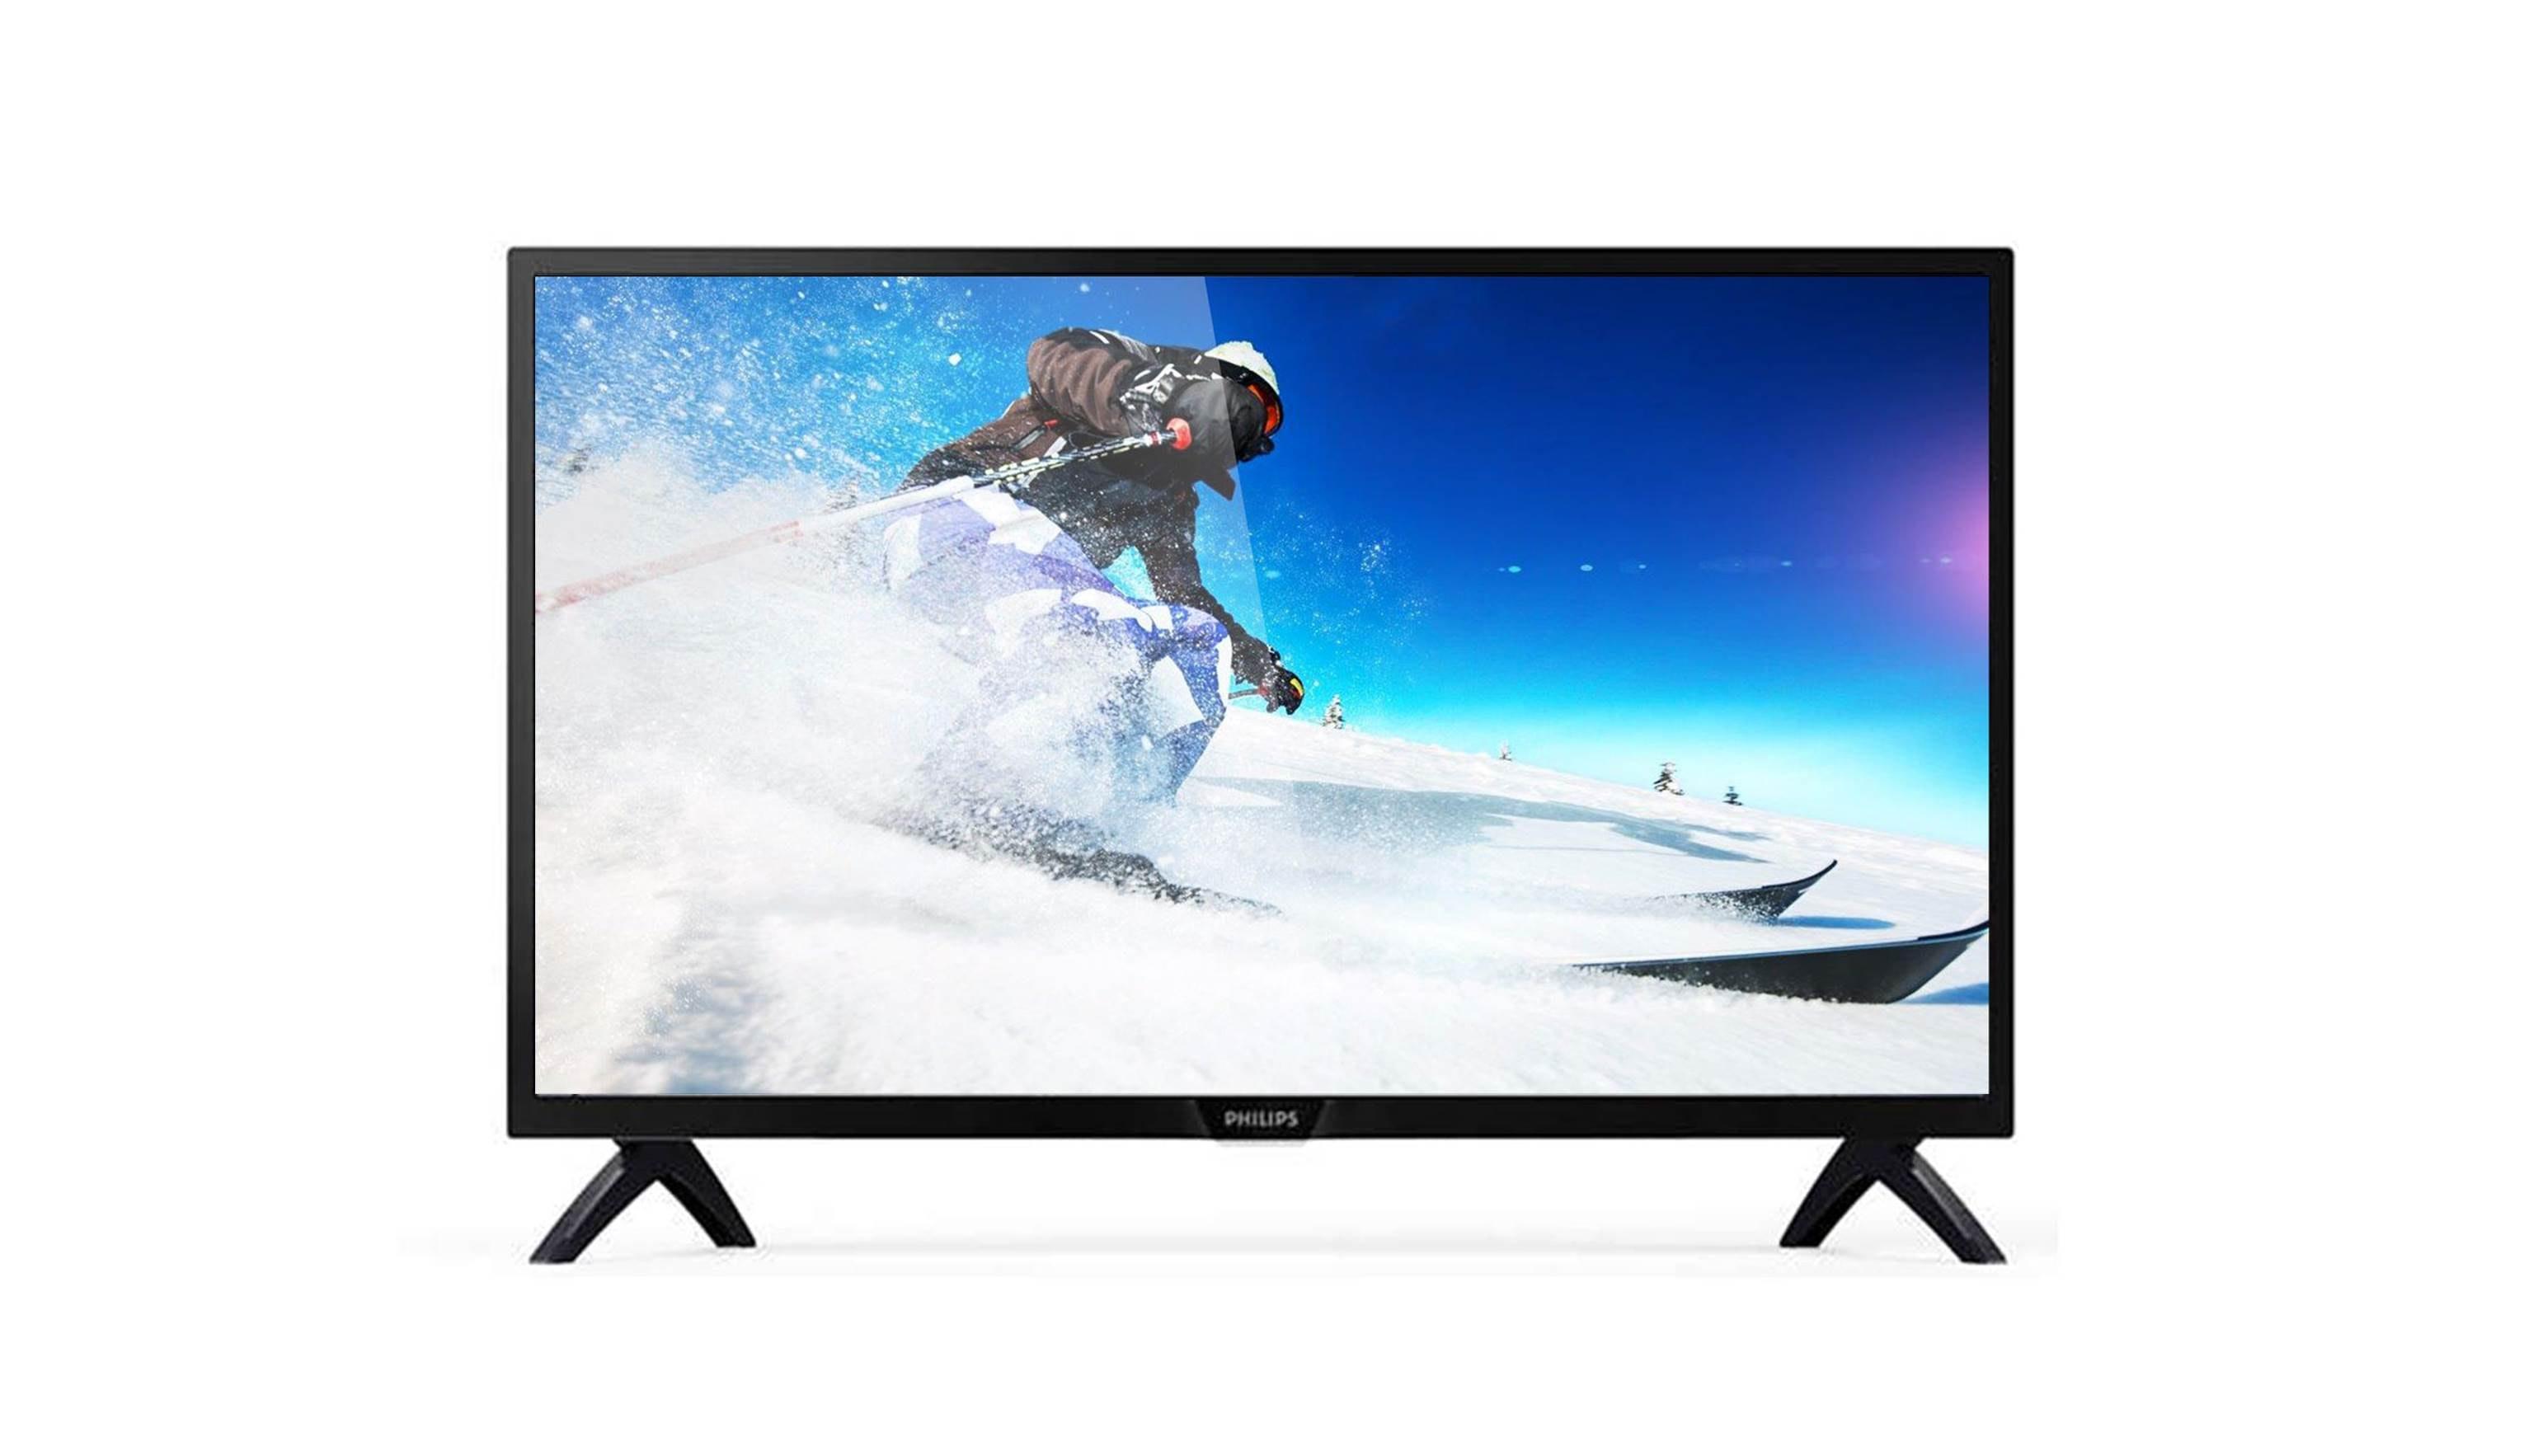 sony tv harvey norman. philips 32pht4002 32 slim led tv (1) sony tv harvey norman